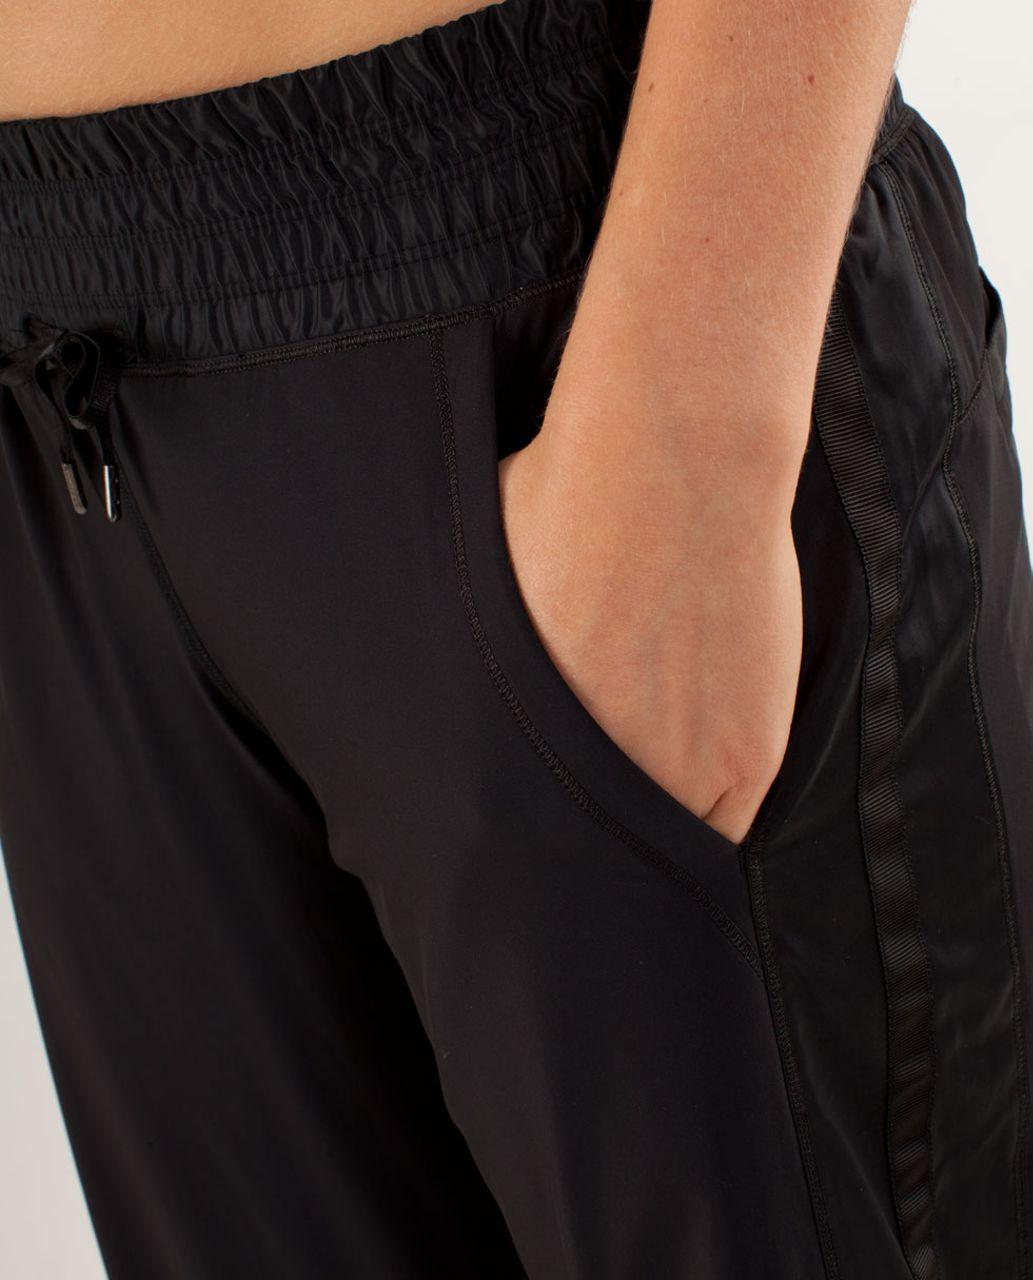 Lululemon Run:  Right Round Pant - Black